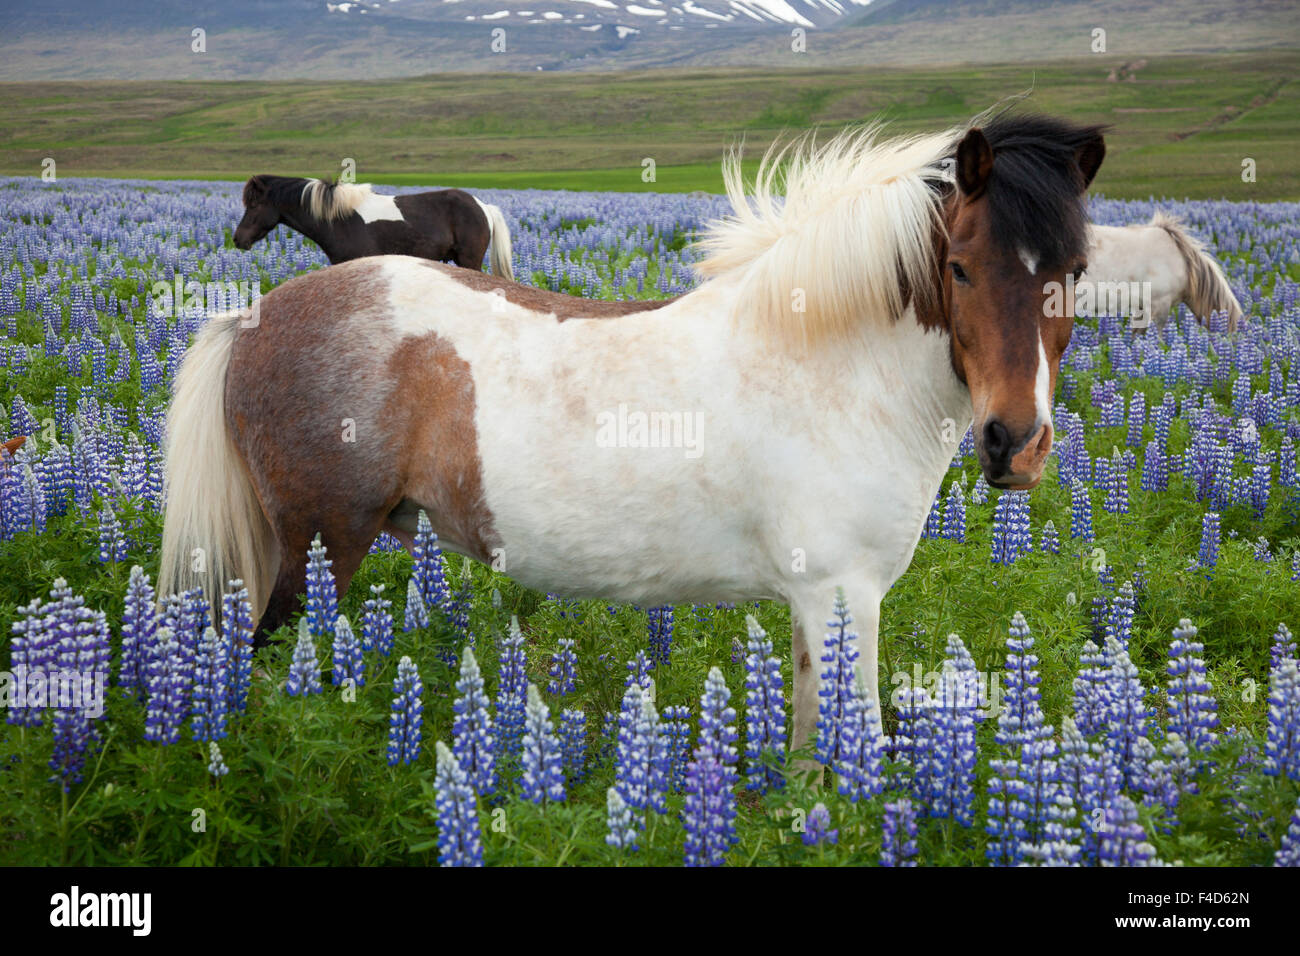 Icelandic horses in a meadow of Blue Alaskan lupins, Varmahlid, Skagafjordur, Nordhurland Vestra, Iceland. - Stock Image